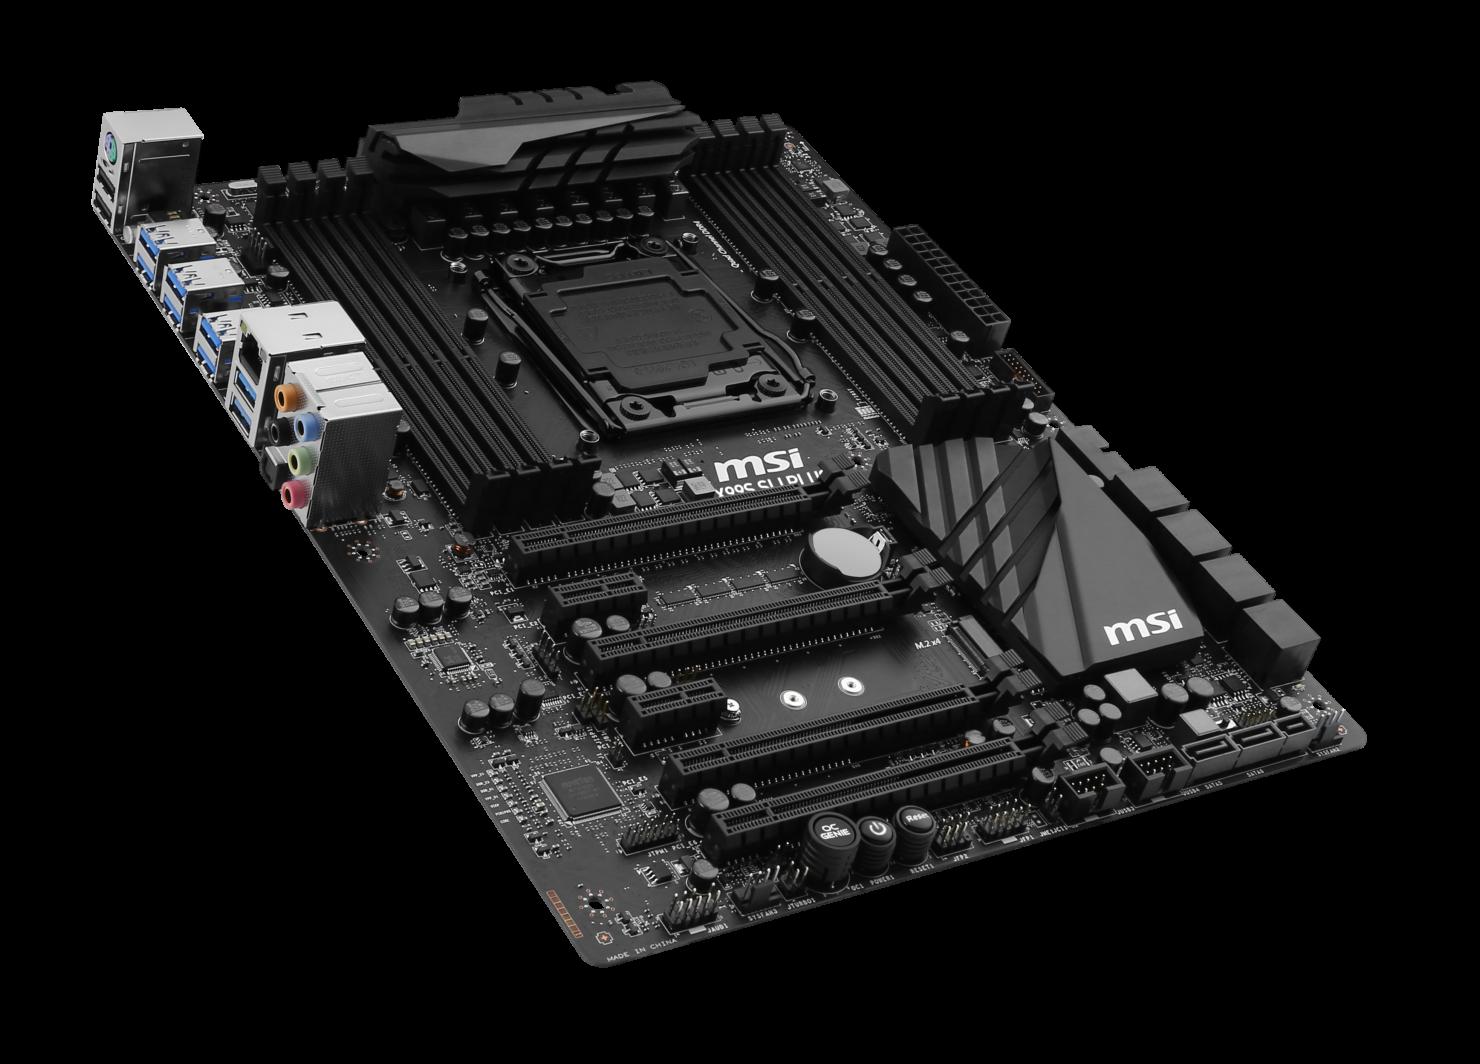 msi-x99s-sli-plus-motherboard-4